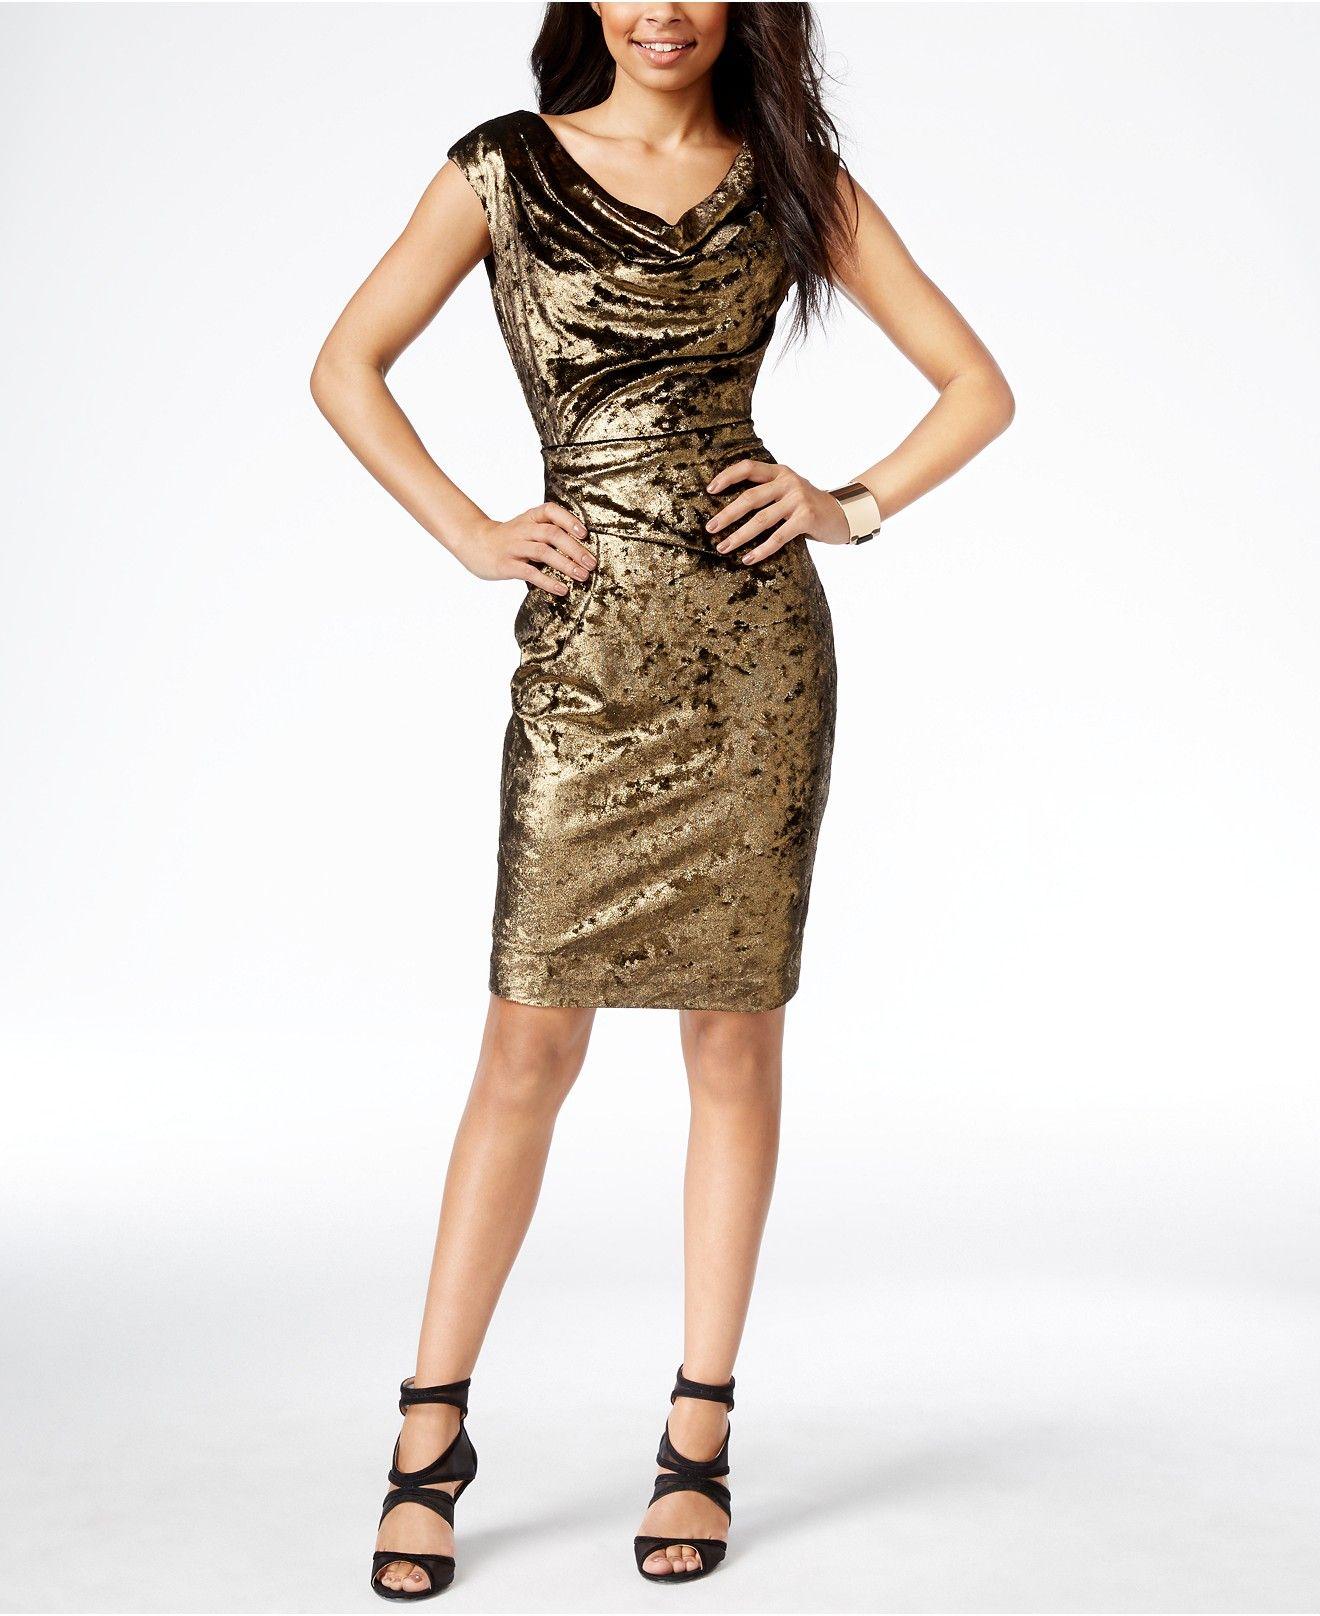 Vince Camuto Velvet Metallic Sheath Dress What S New Women Macy S Clothes Design Velvet Cocktail Dress Dresses [ 1616 x 1320 Pixel ]